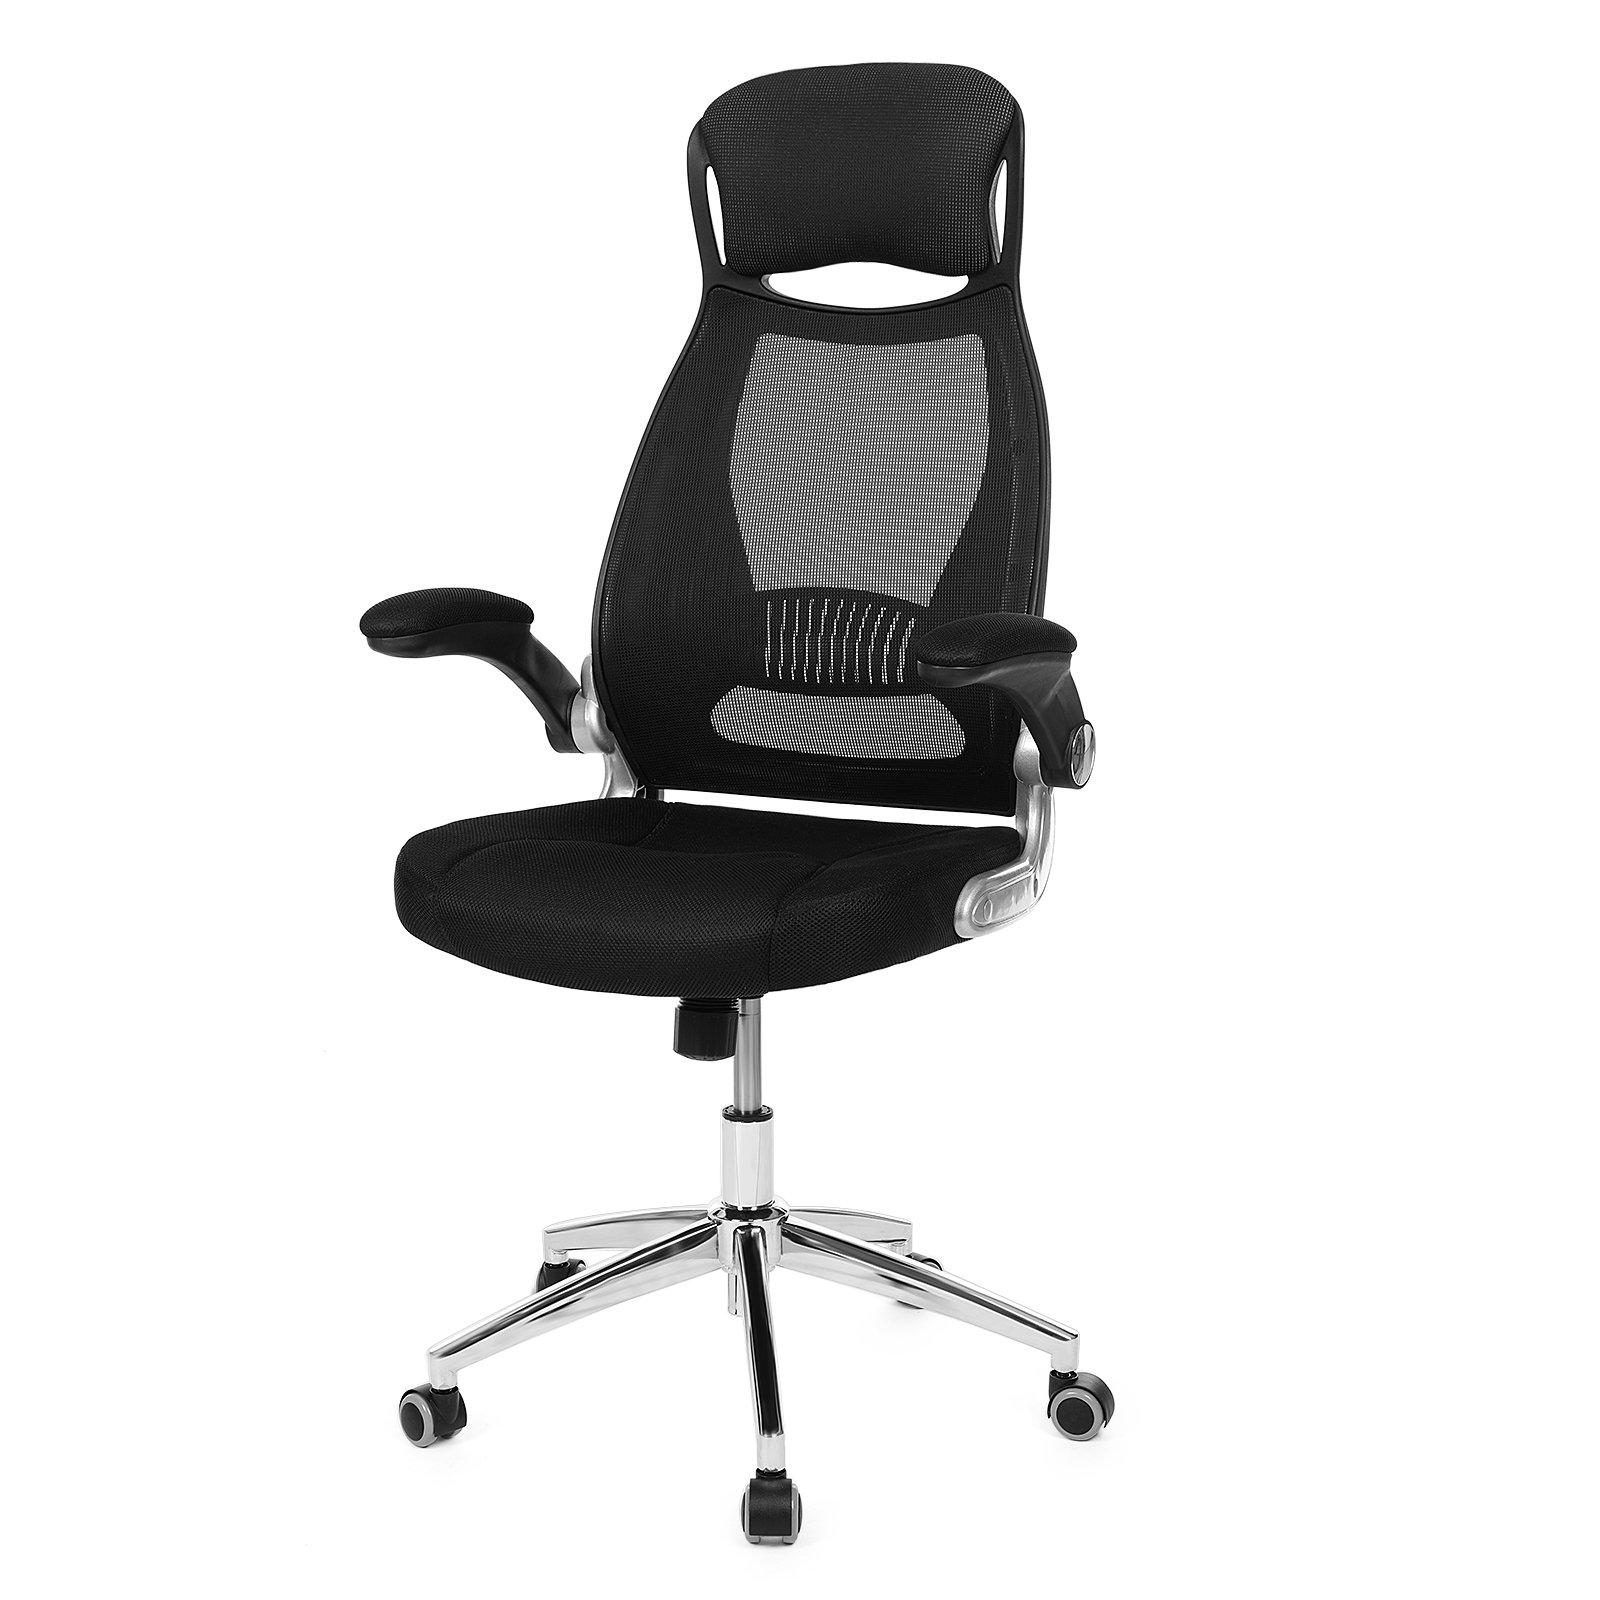 SONGMICS Mesh Ergonomic Office Chair with Contoured Backrest, Home Swivel High Back Computer Chair Flip up Armrests, Tilt Lock Function, Black UOBN86B